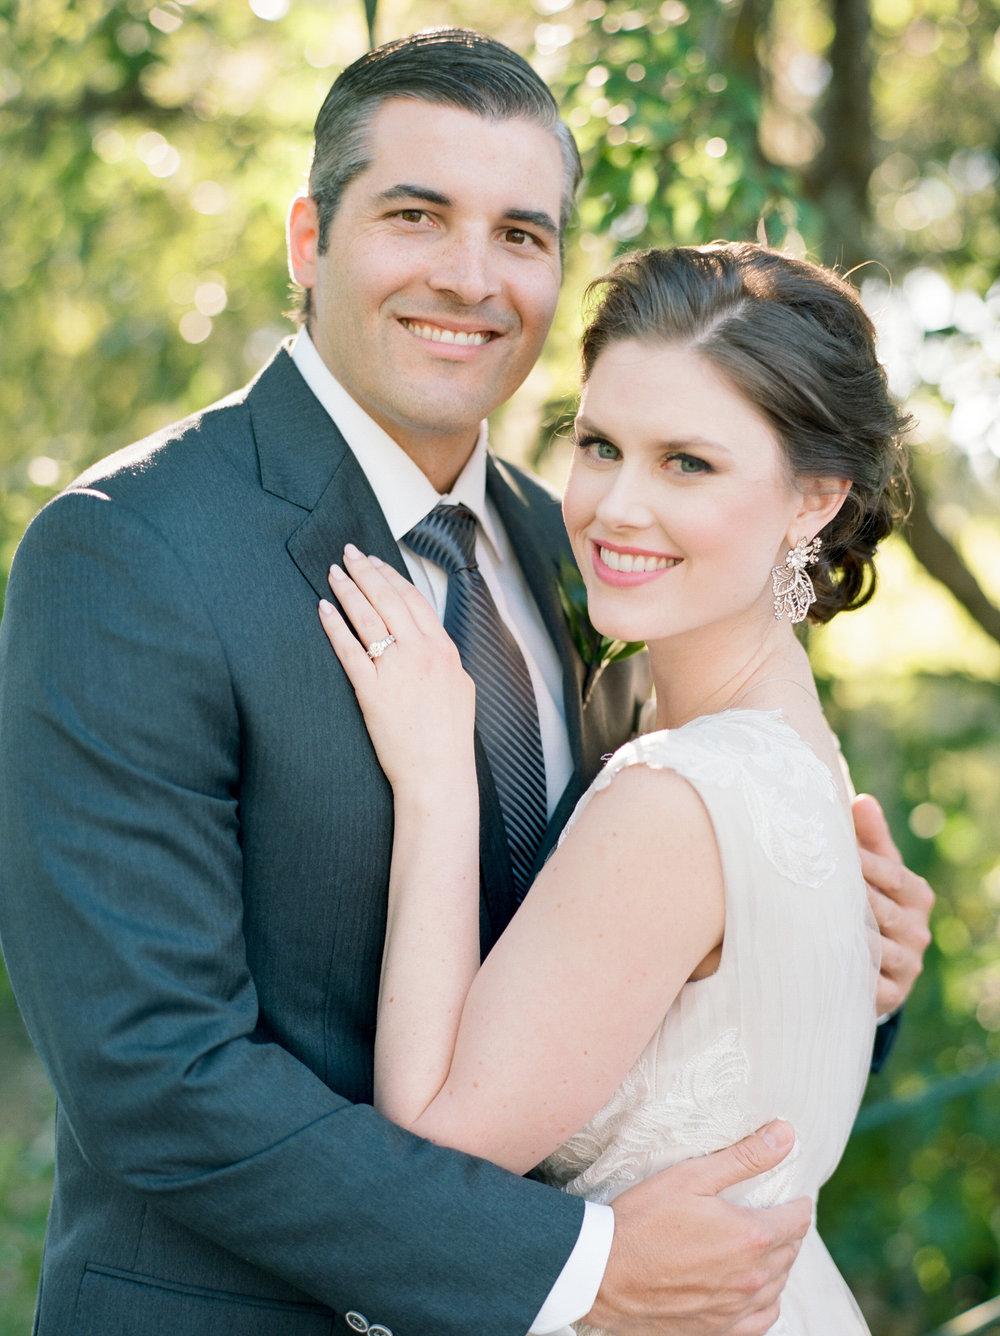 Houston-Wedding-Photographer-Lakeside-Country-Club-First-Look-Bride-Groom-Formals-Film-Fine-Art-Photography-22.jpg